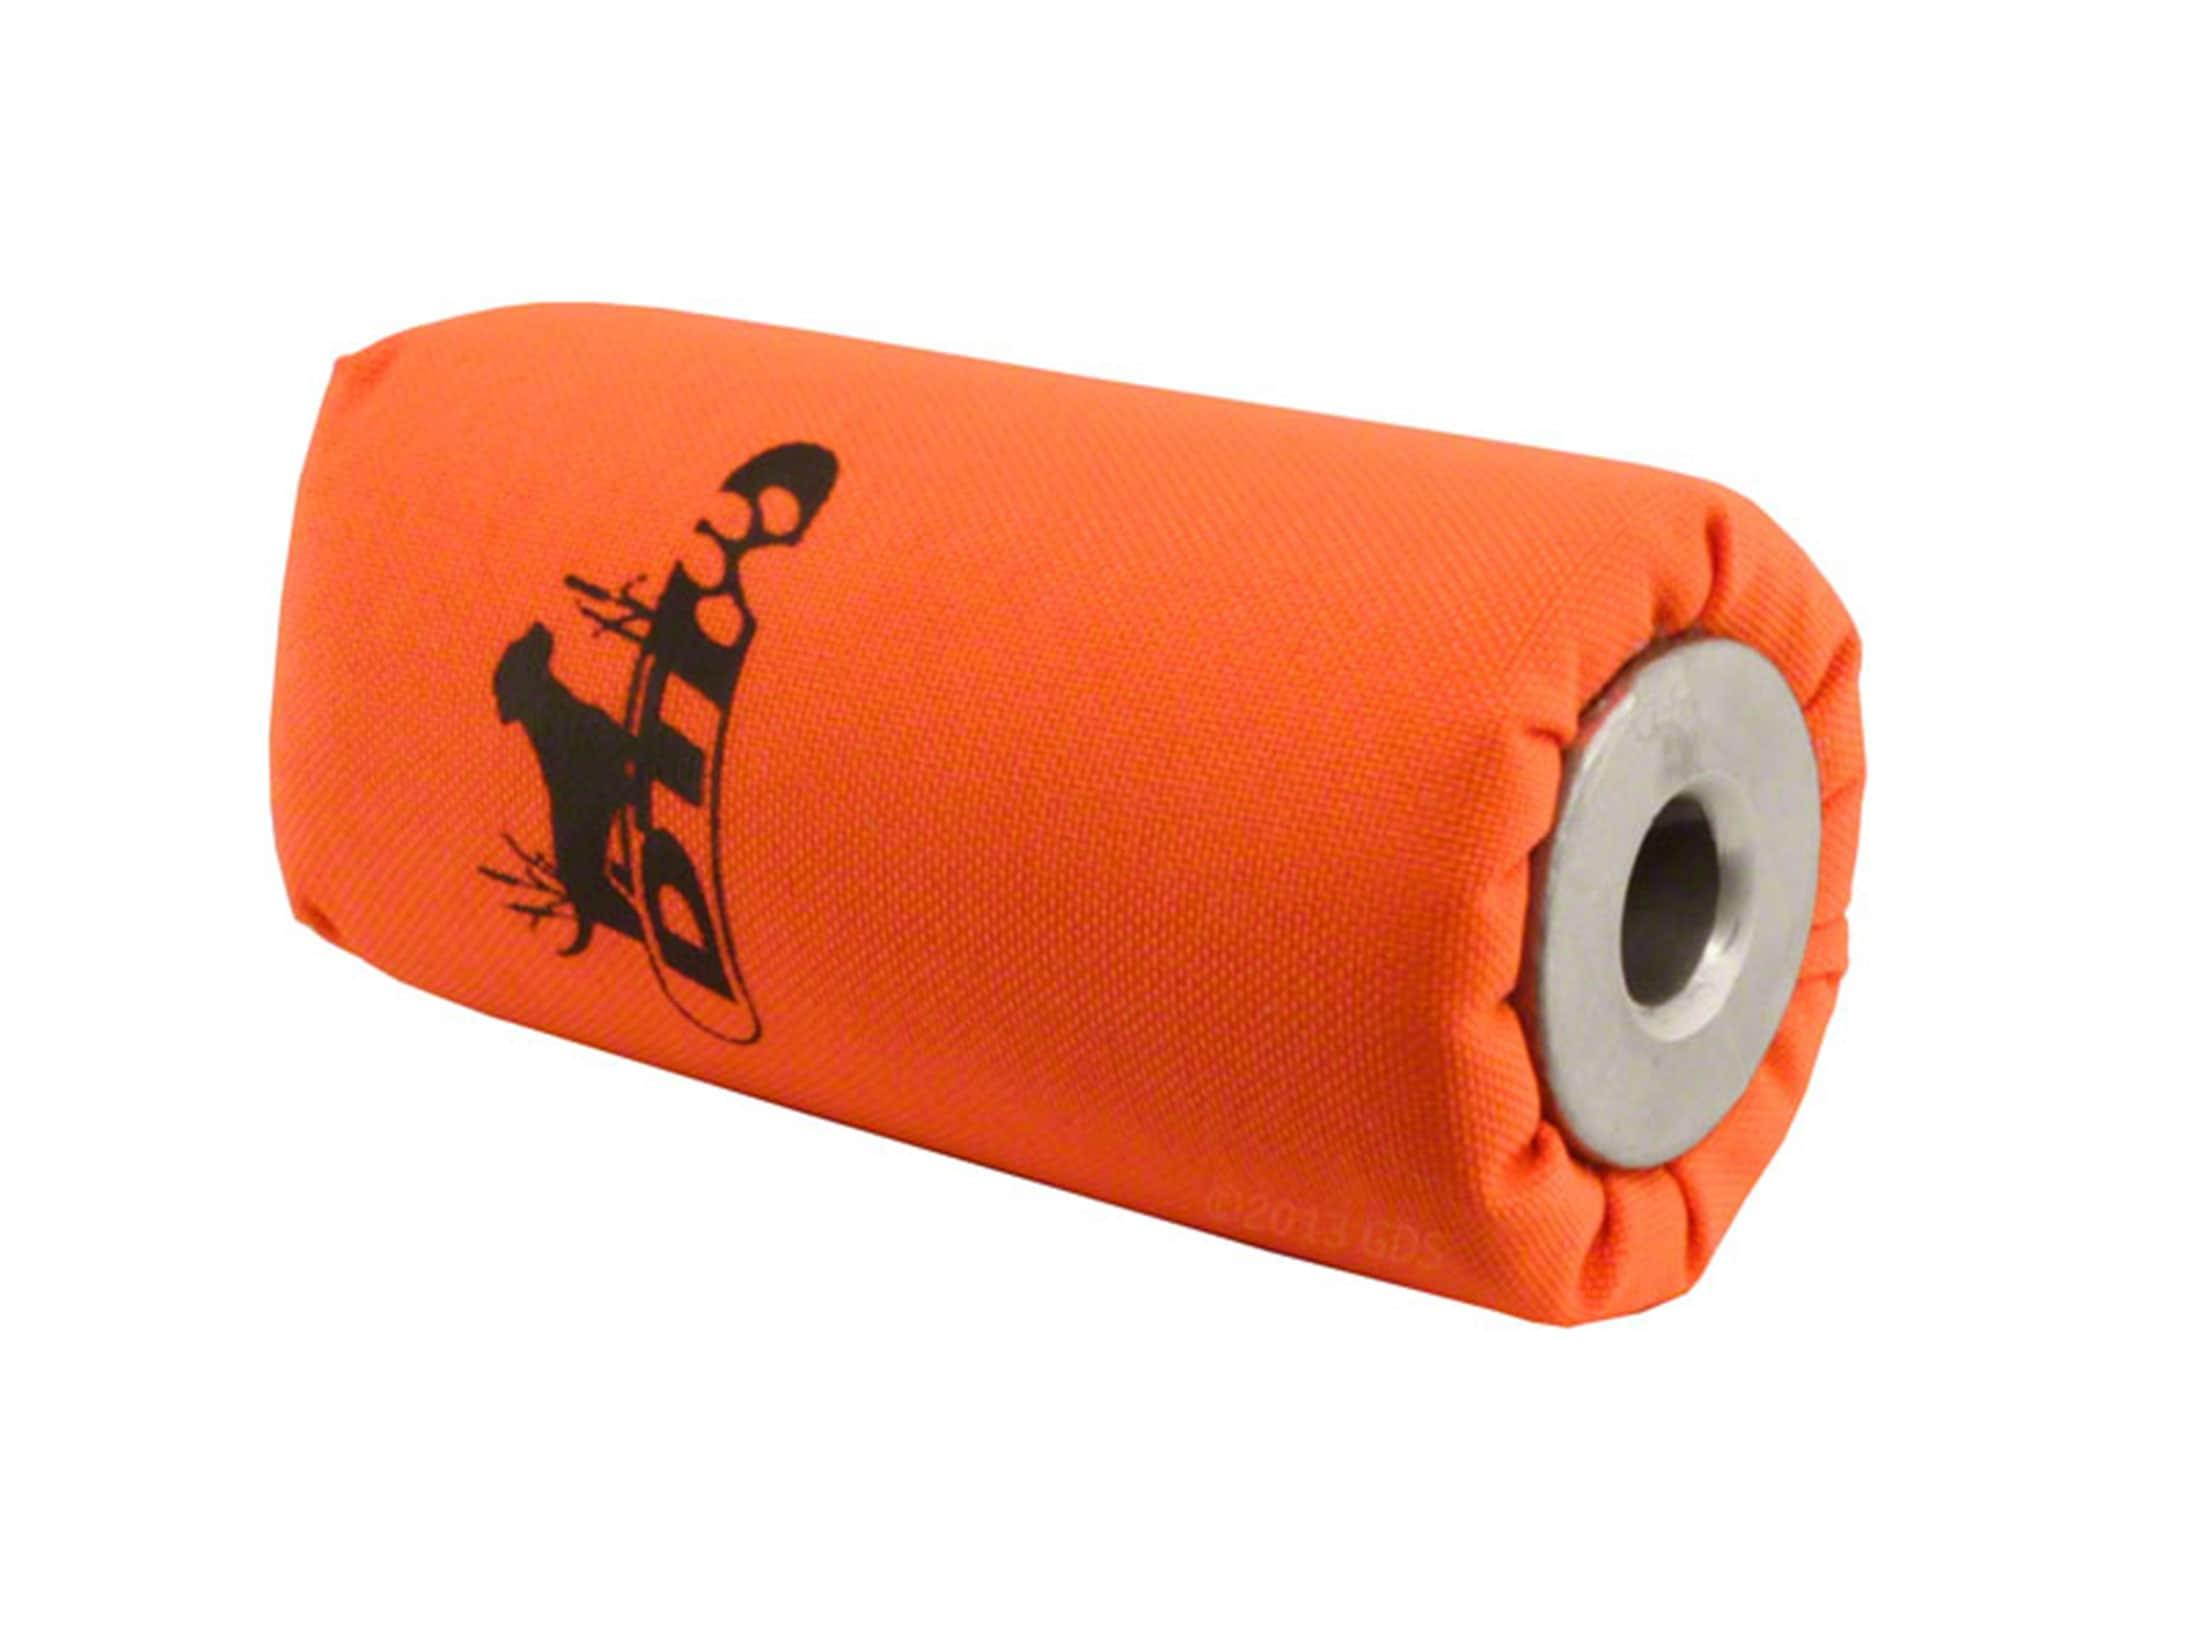 DT Systems Super Pro Launcher Dummy Hand Held Dog Training Kit White and Orange